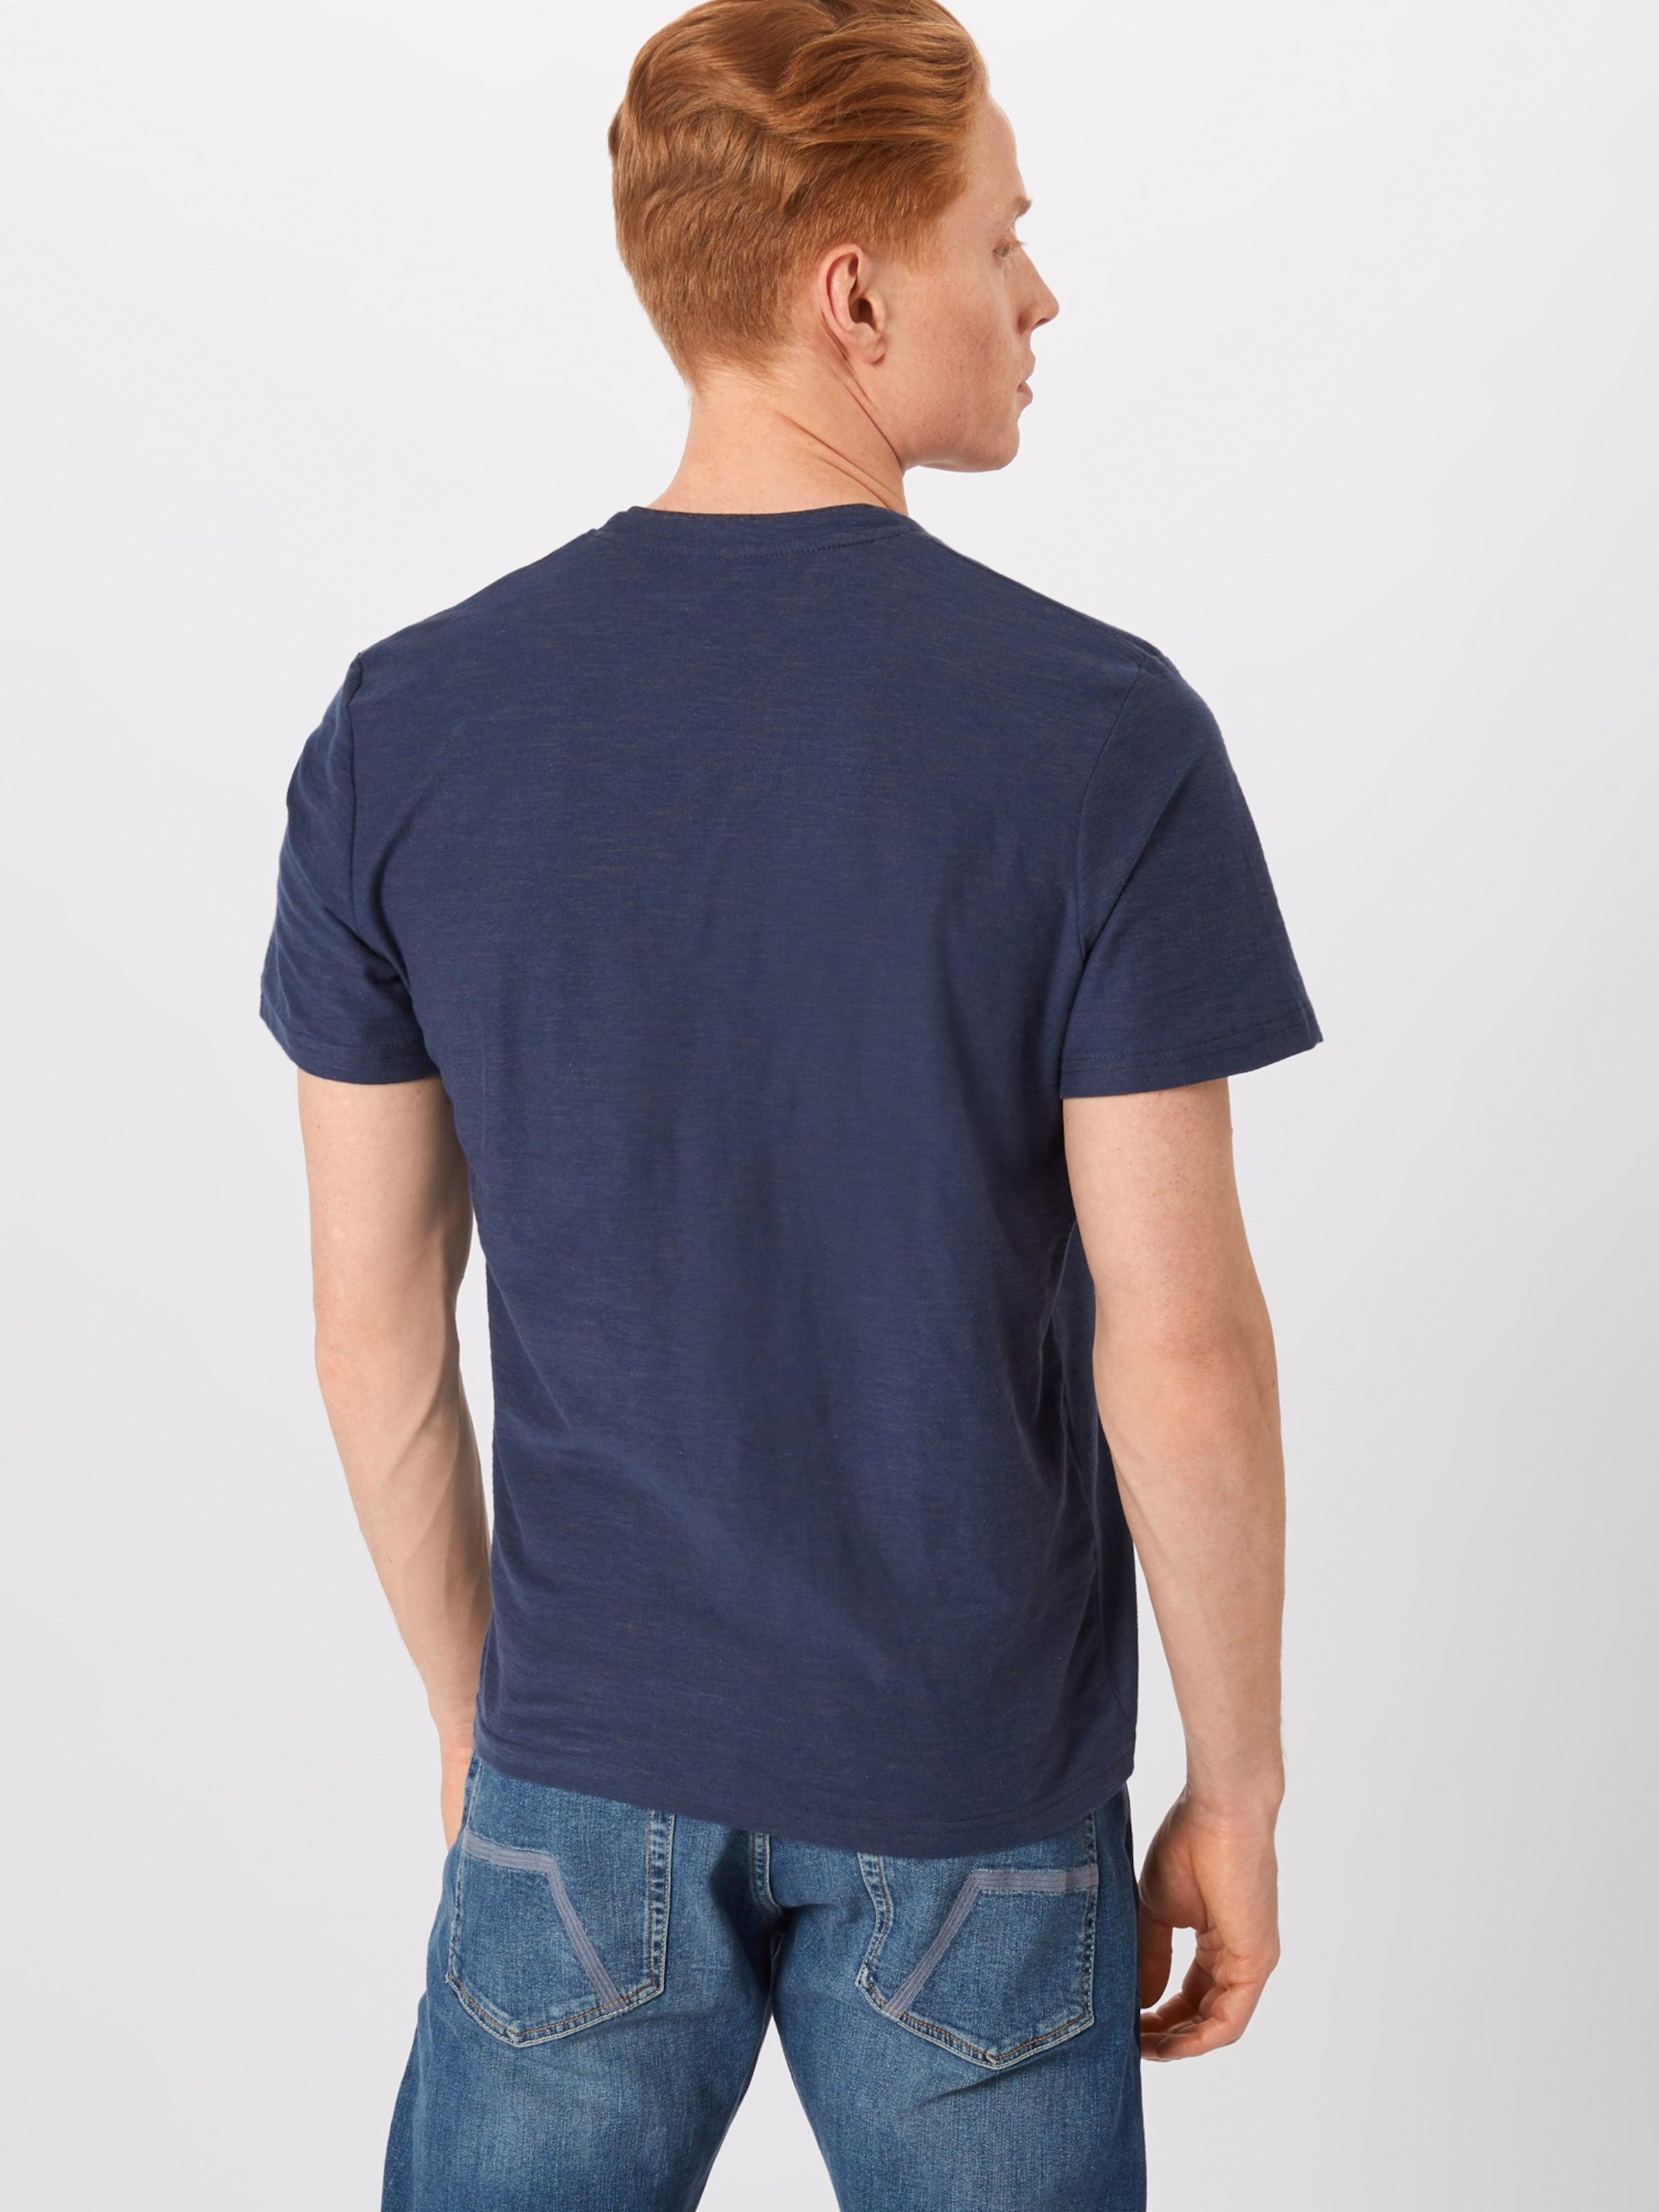 Tailor In Blau Tom Shirt qpUzMVGS